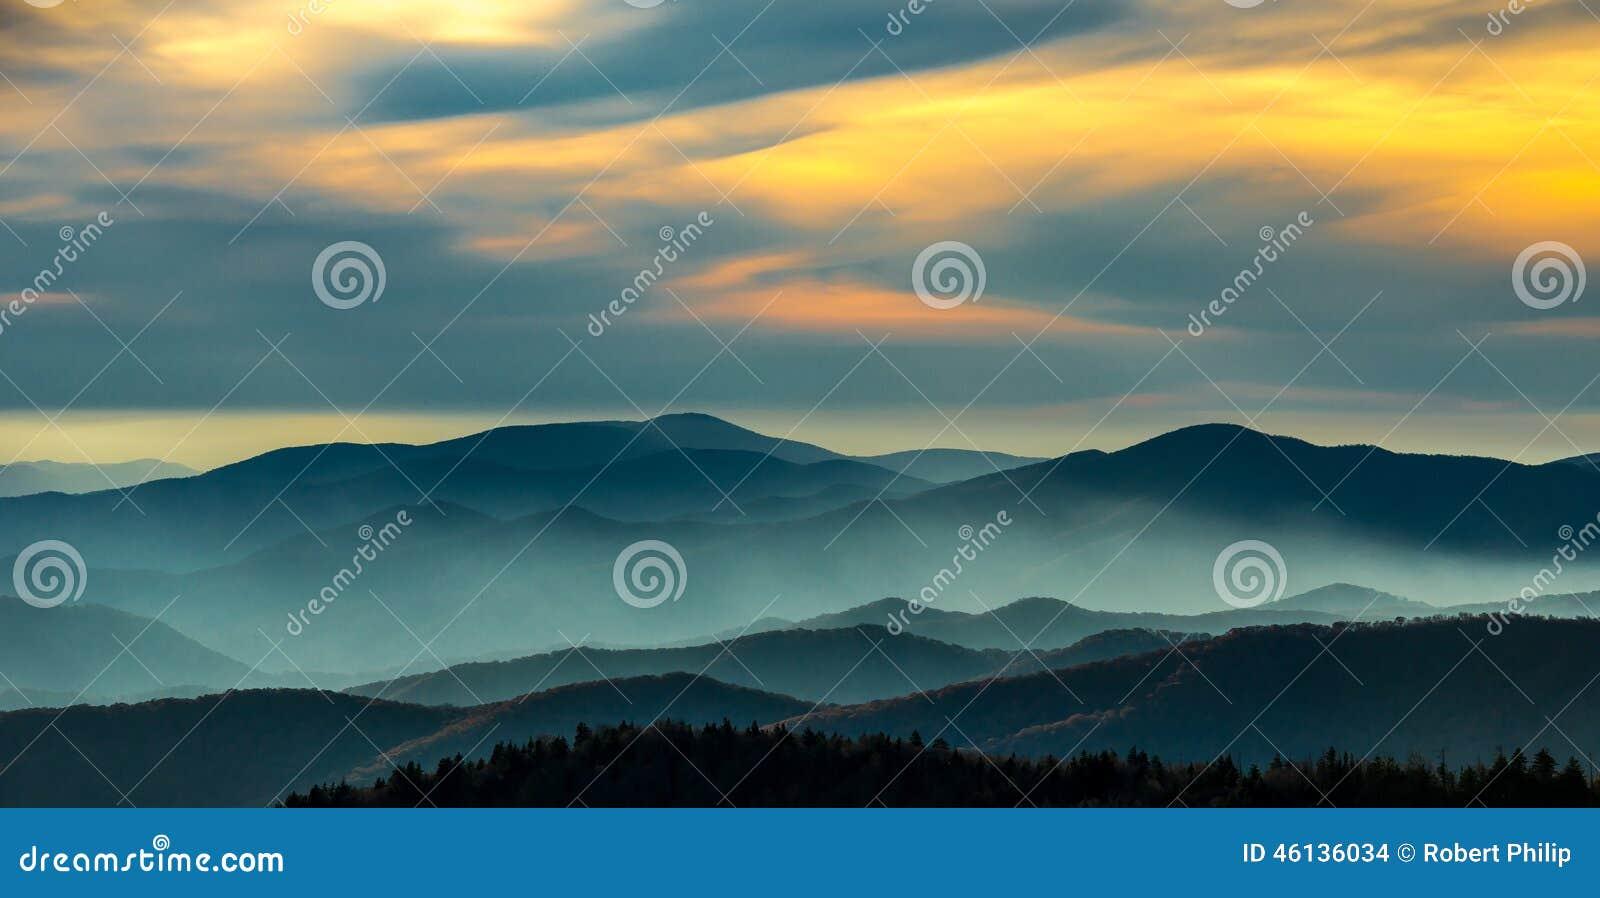 Sunset Great Smoky Mountain National Park